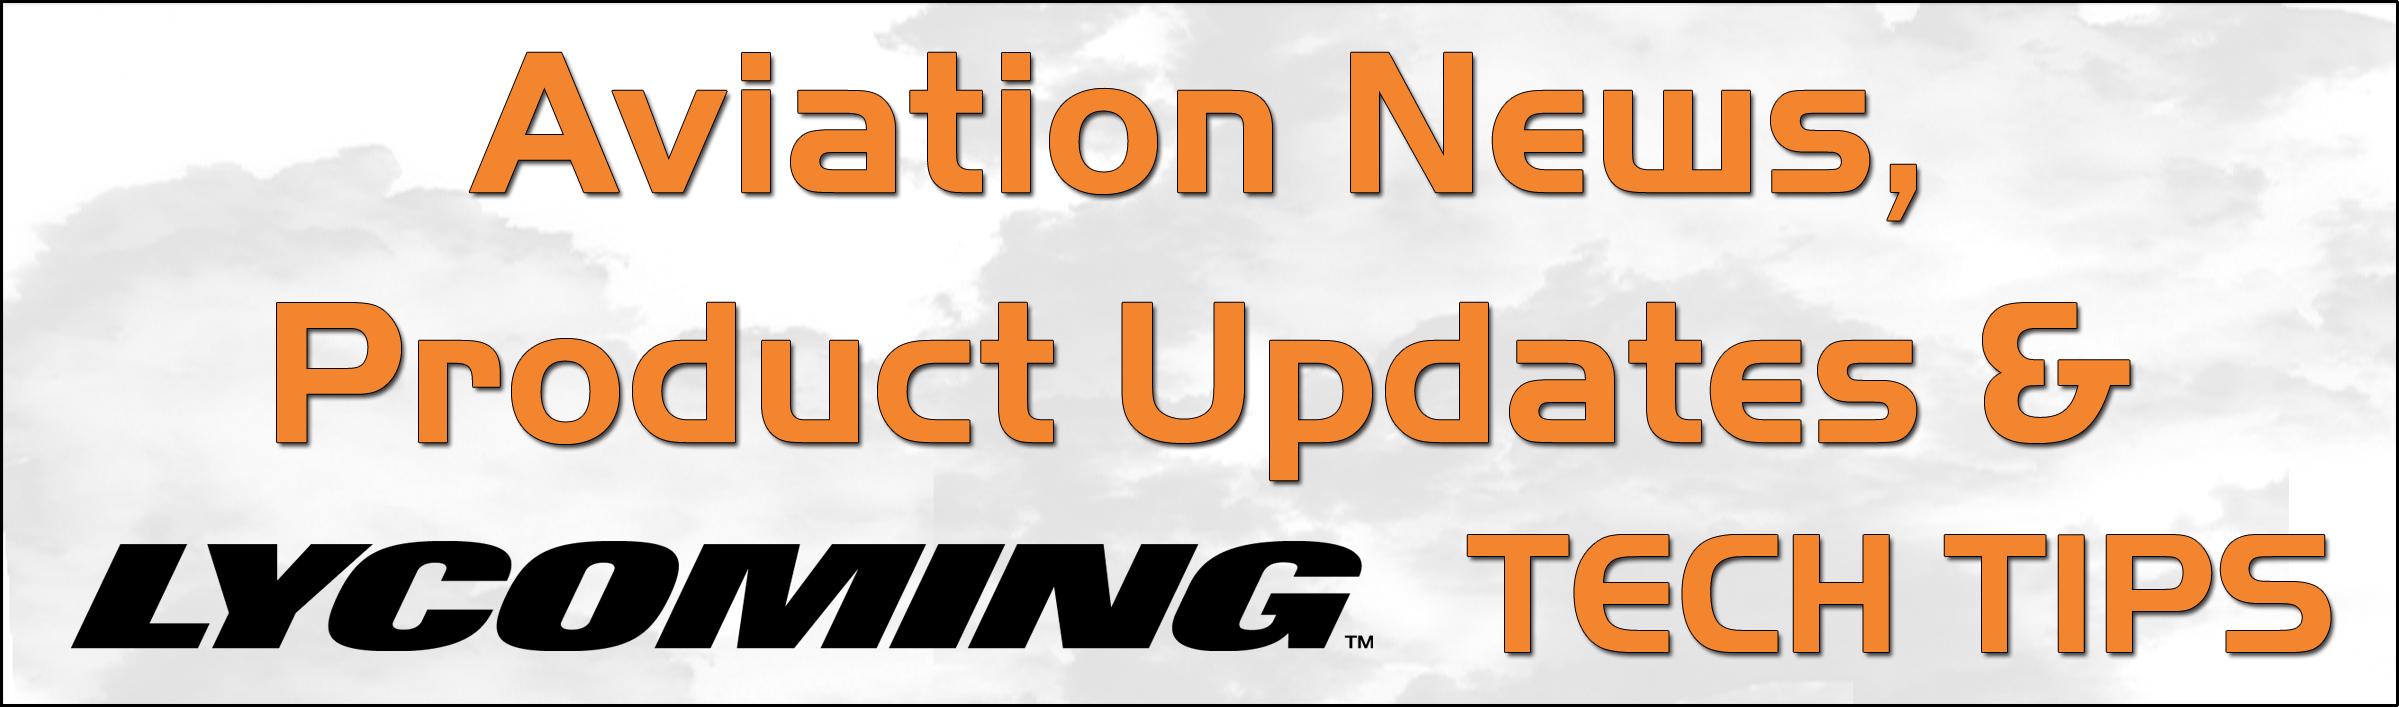 Aviation News & Product Updates